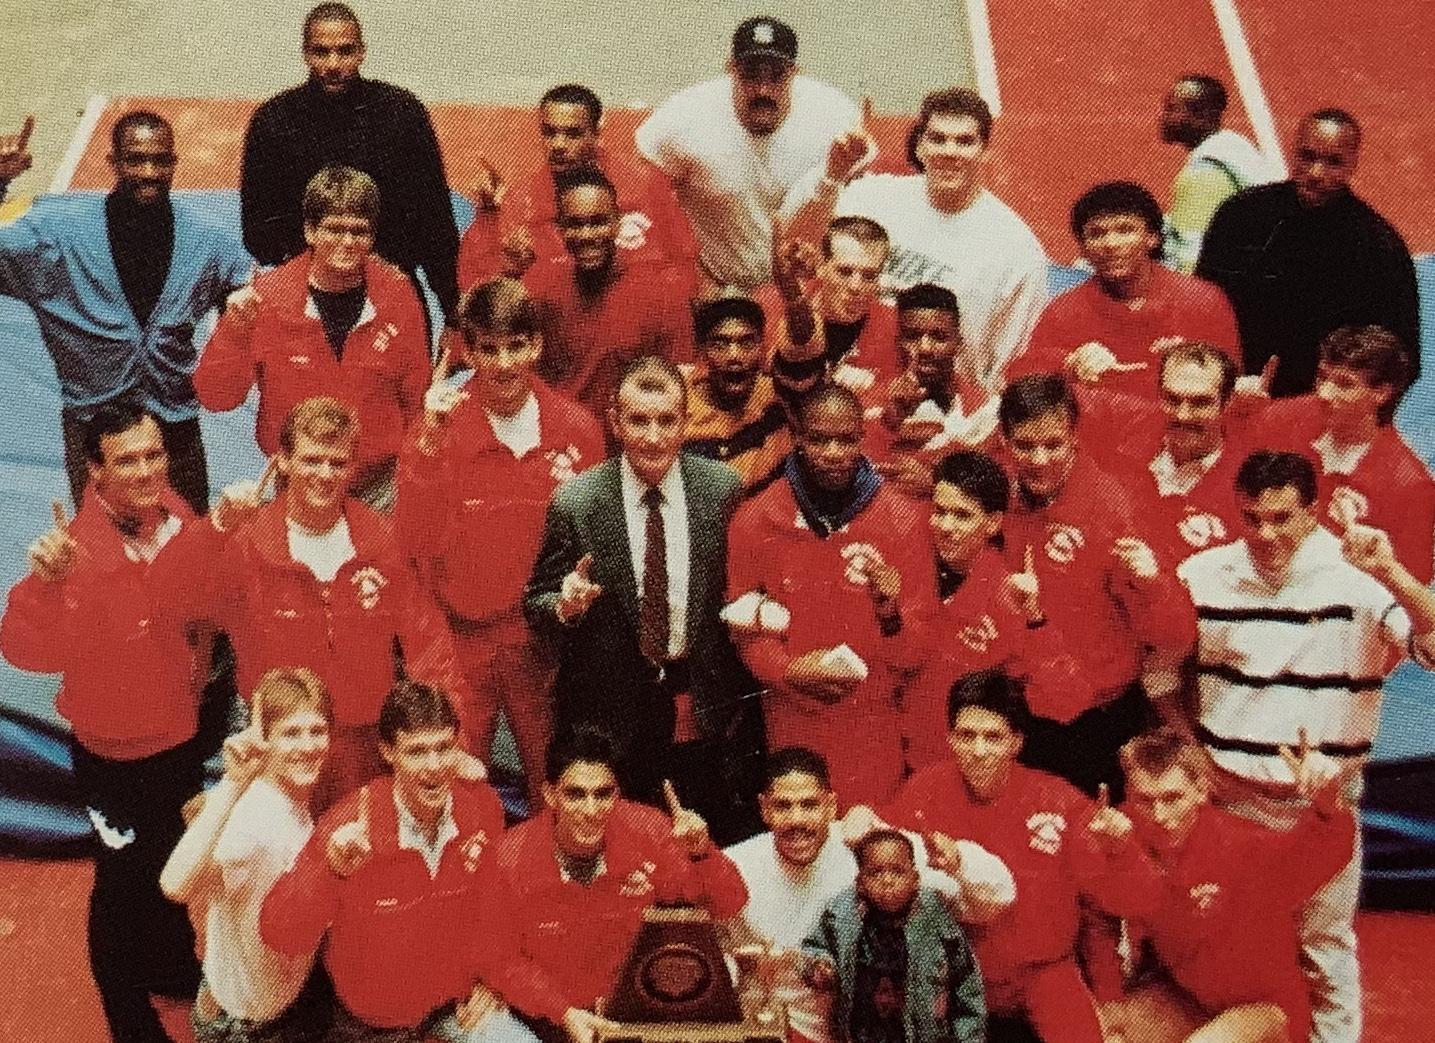 SWC Indoor Champions  (1987, 88 or 90)